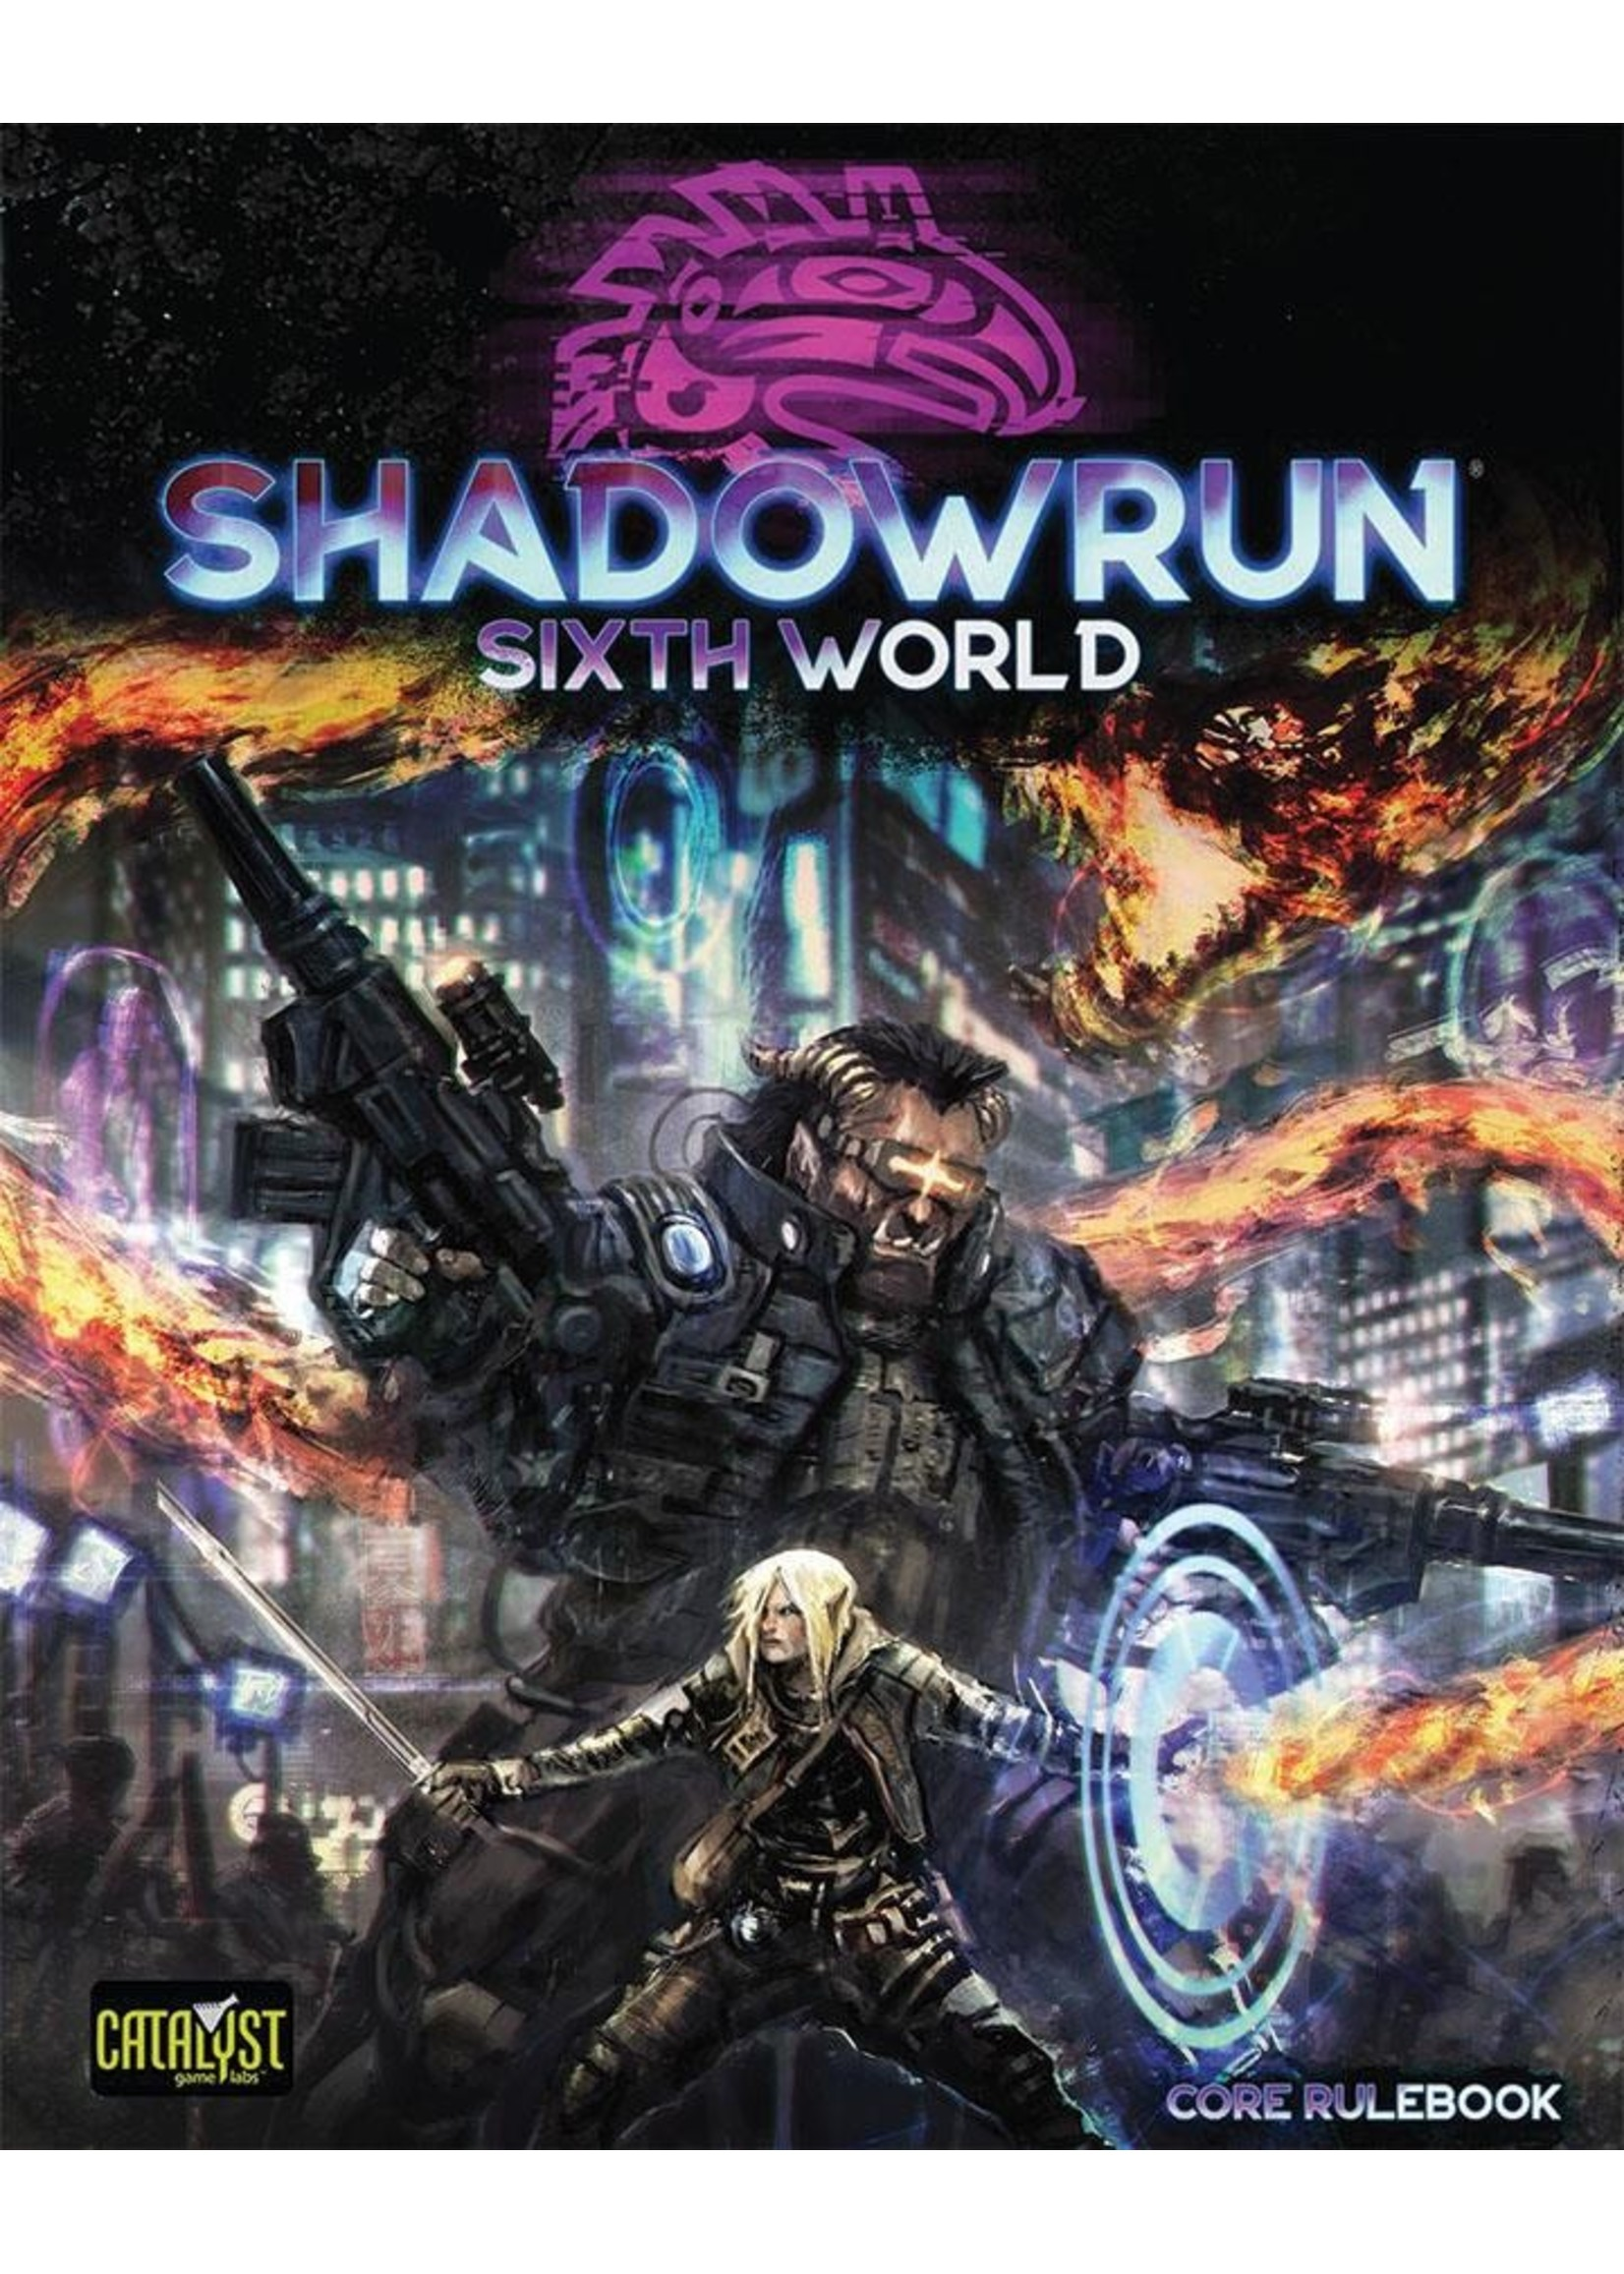 Shadowrun RPG: 6th Edition Core Rulebook (Sixth World)